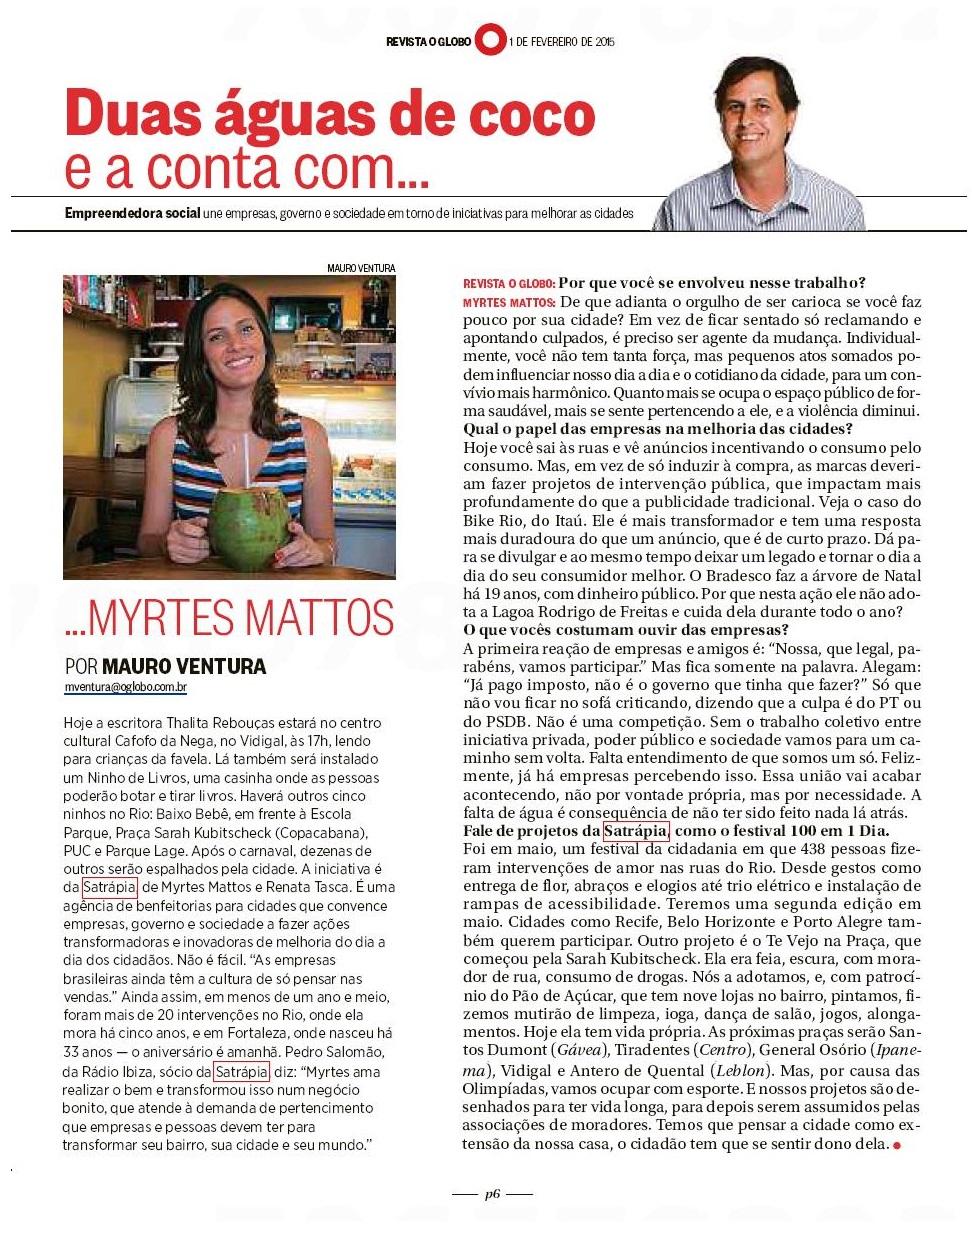 Satrapia_O-Globo_Revista-O-Globo_01-02-2015